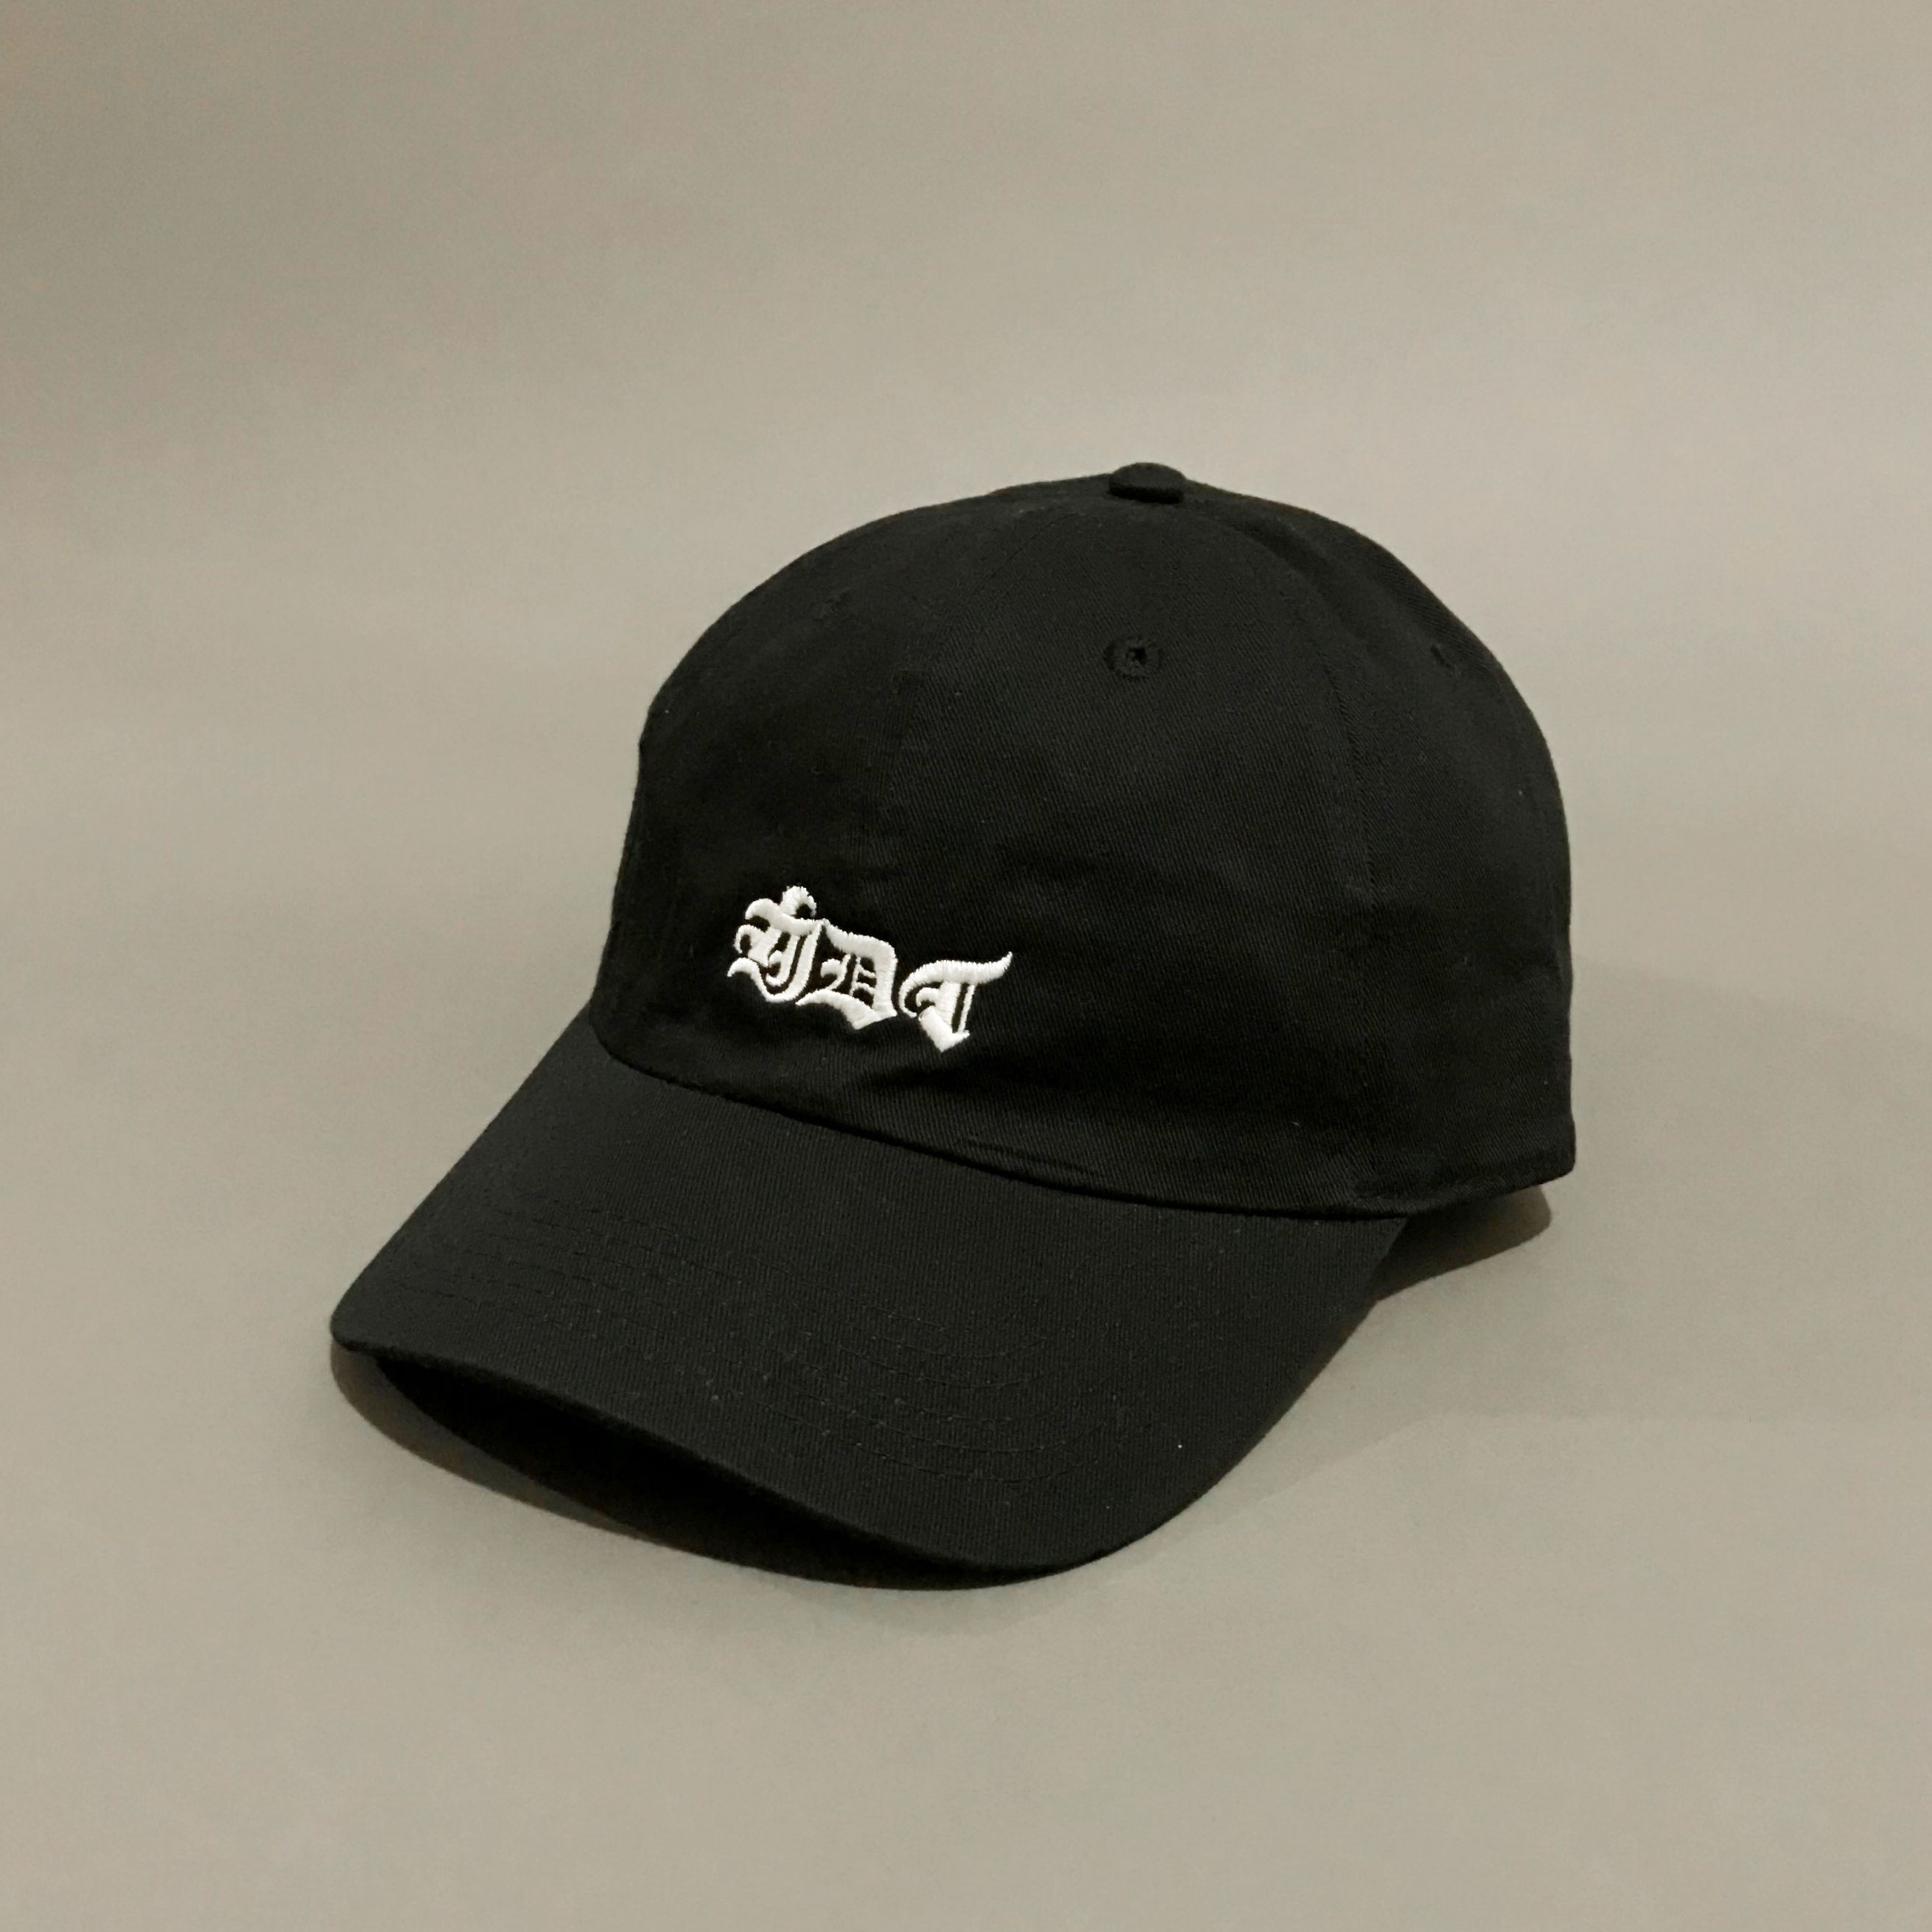 KKCP-003-BLK